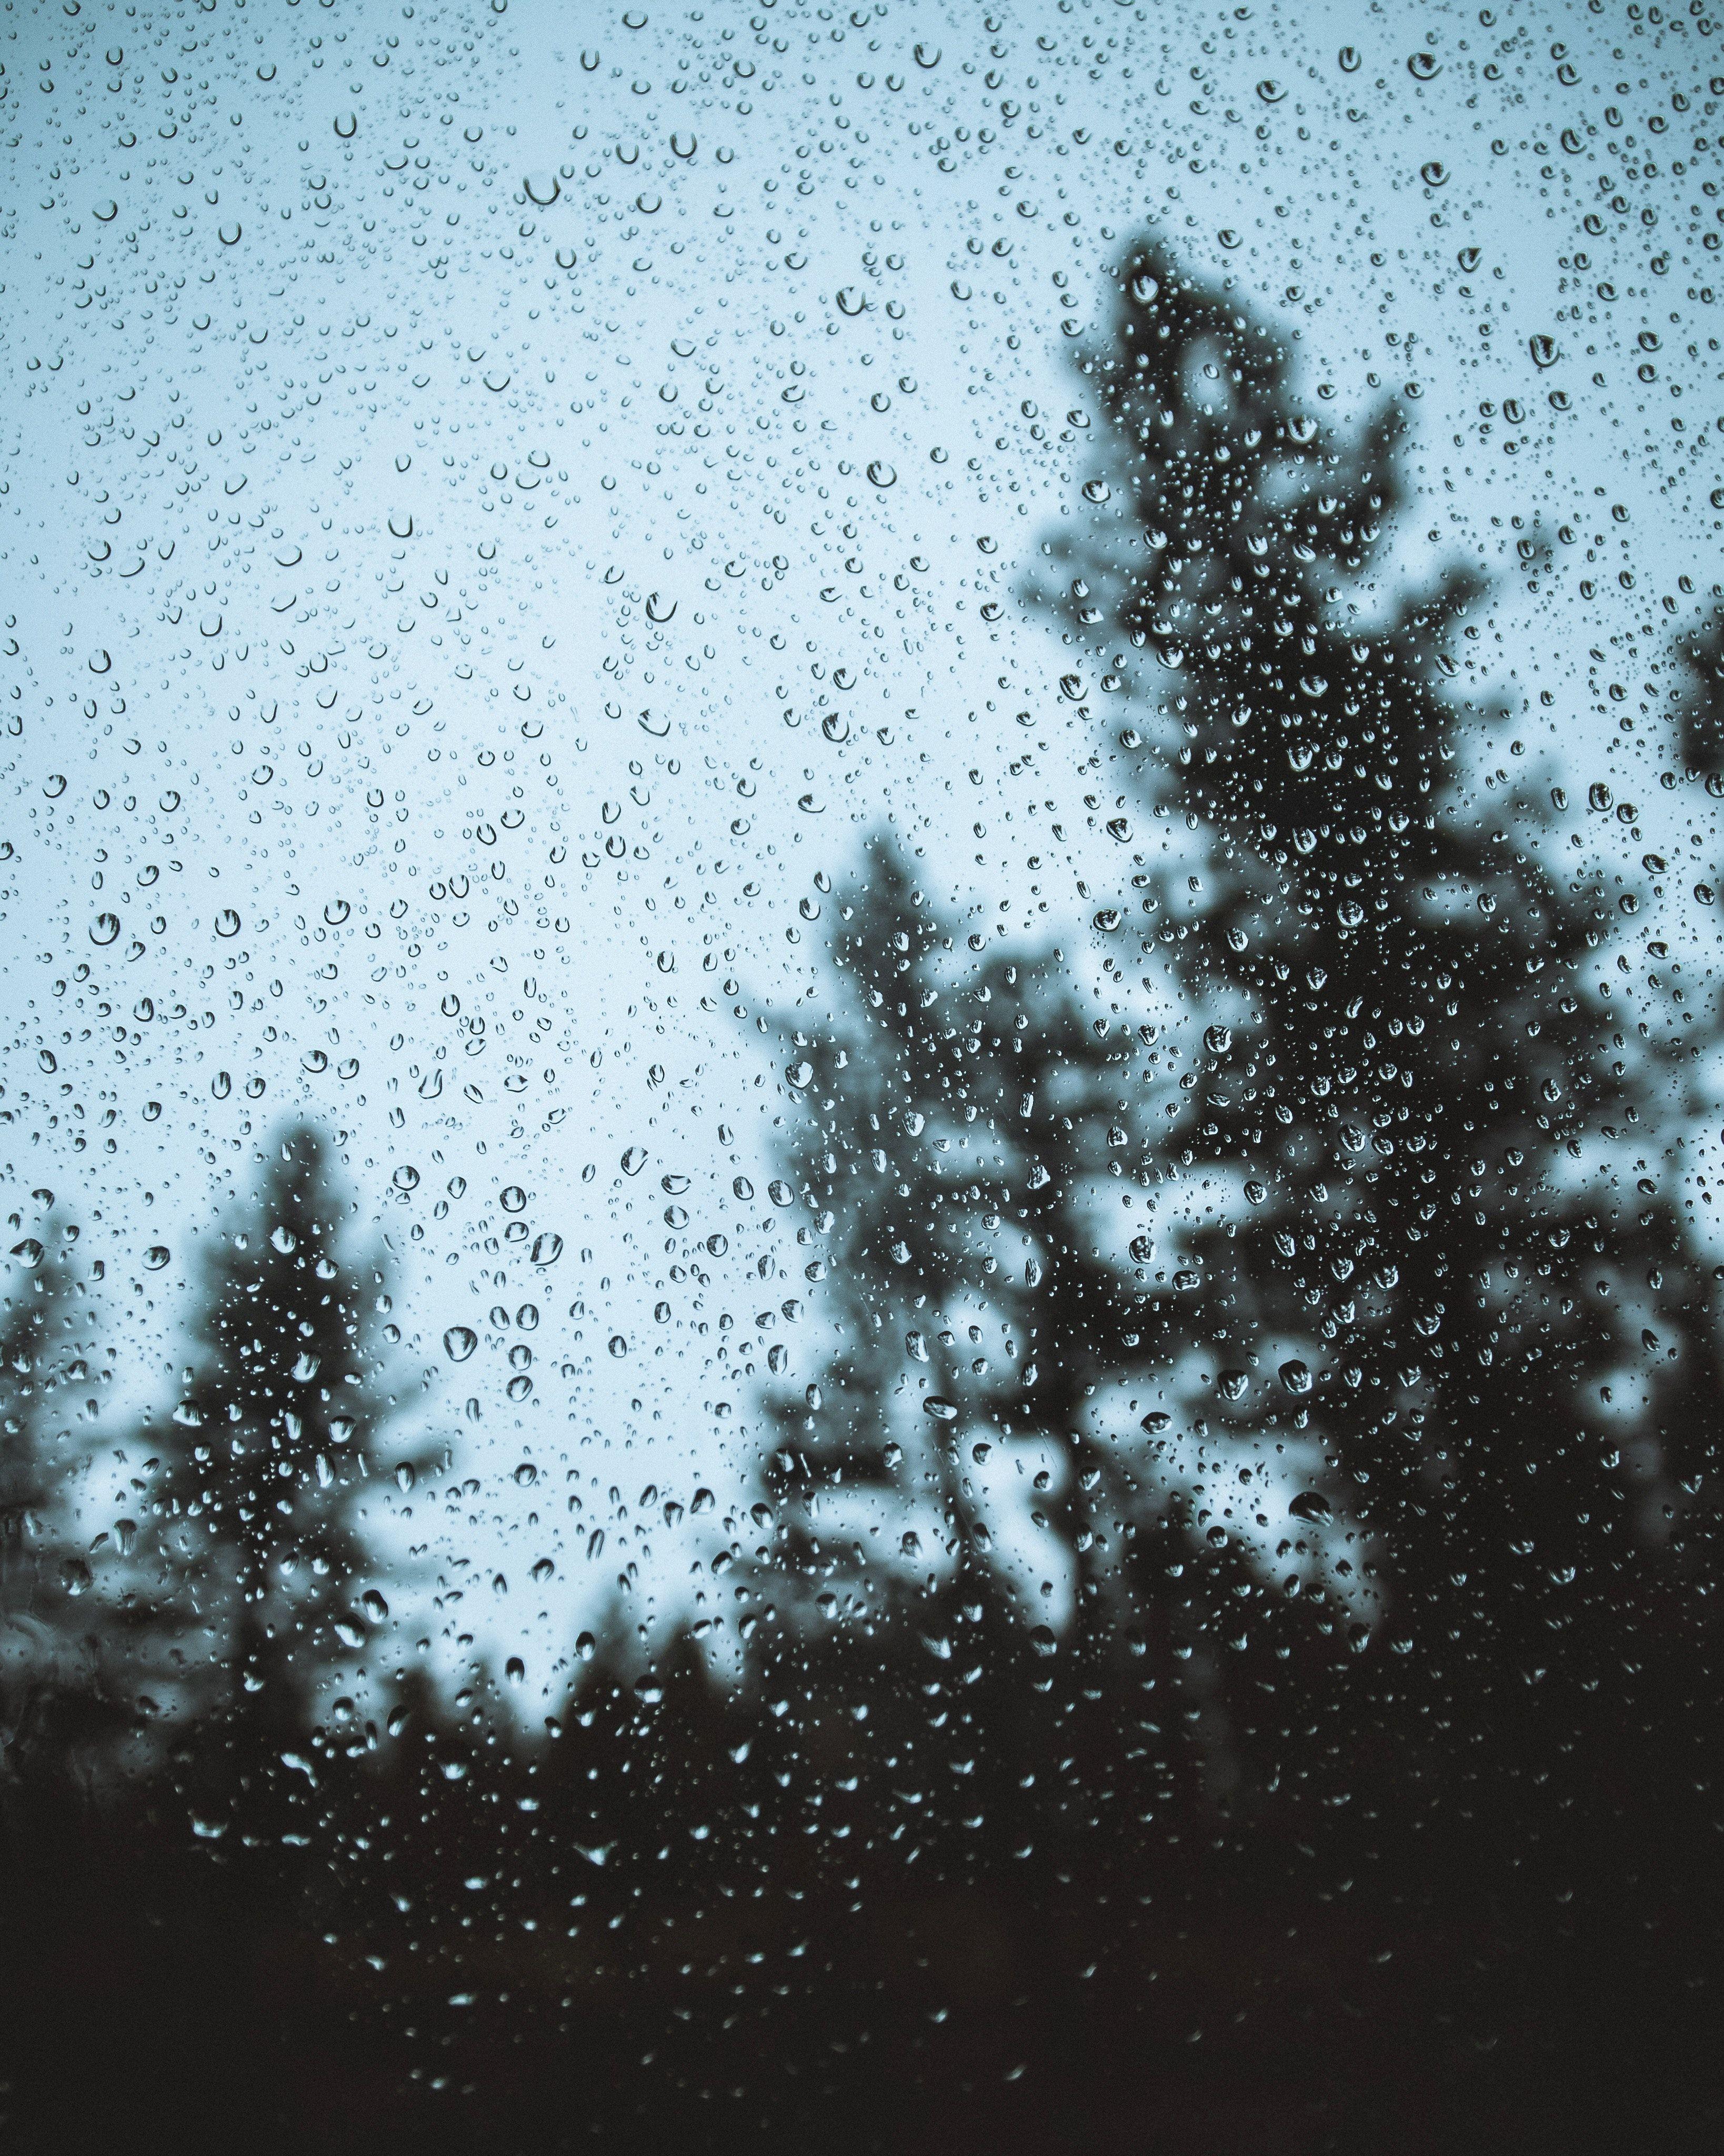 Evergreen trees behind a rainy window